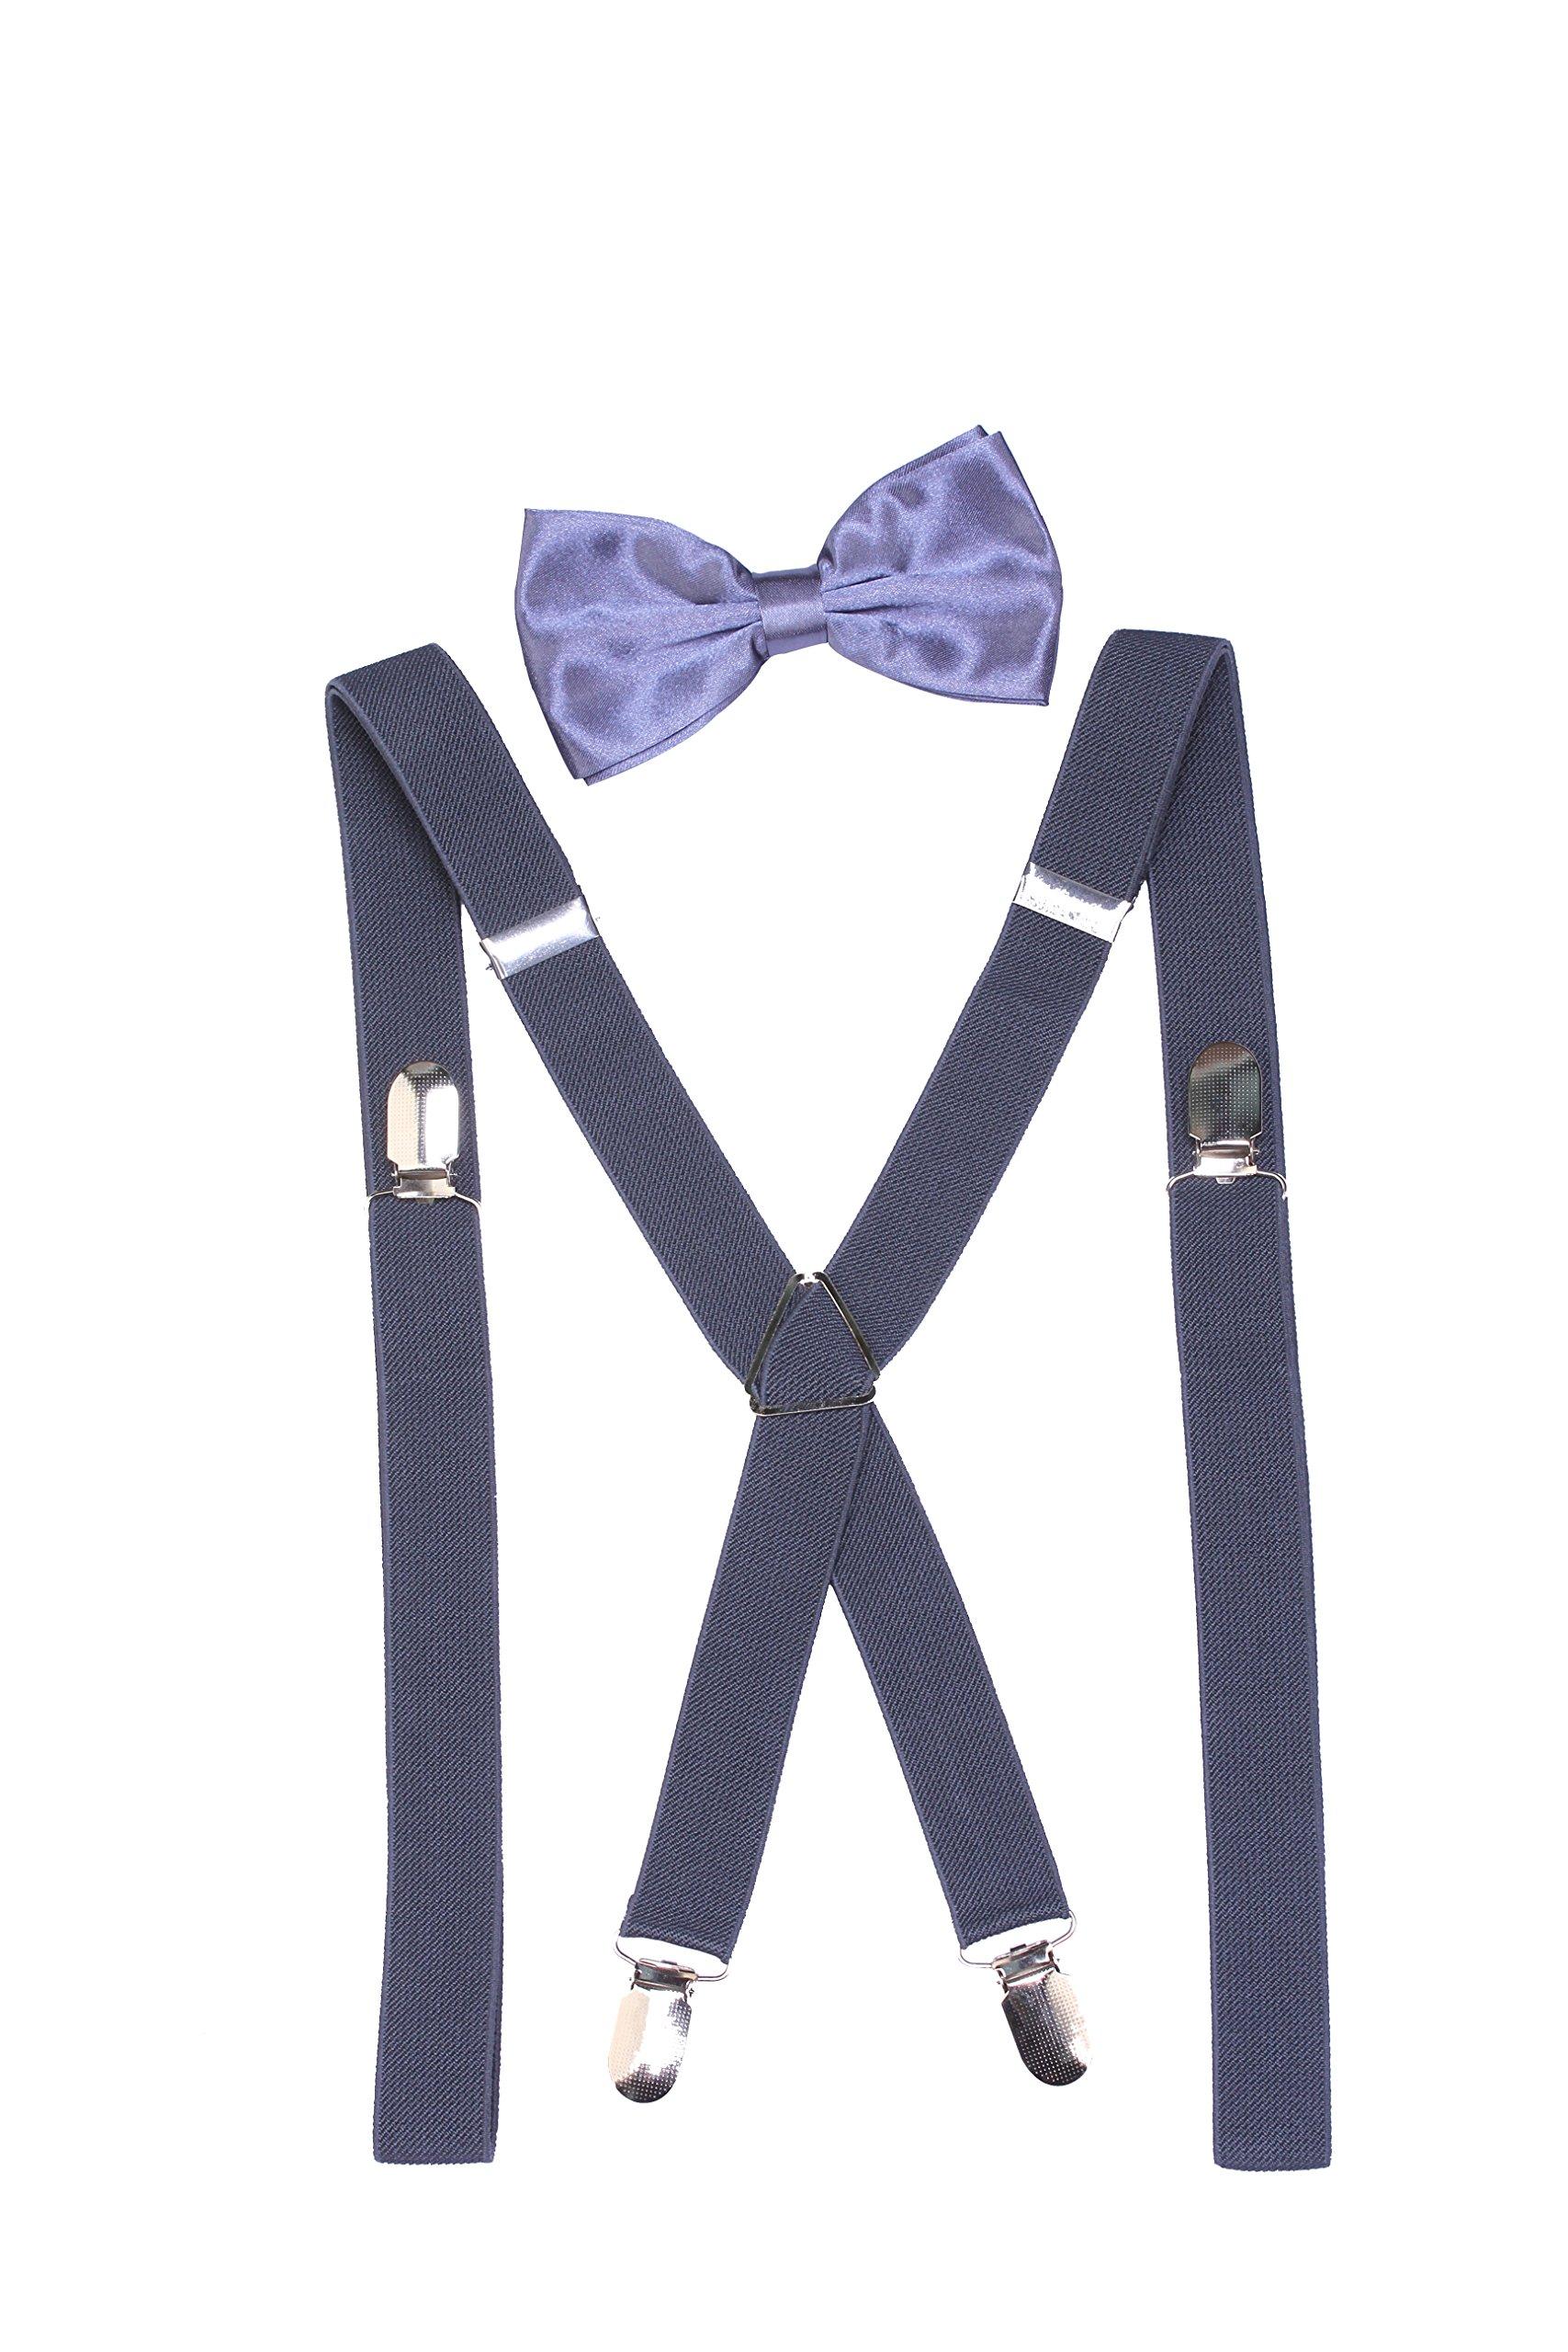 942daf5ed38b Men's X-Back Clip Suspenders Bow Ties Set for Men Tuxedo Weddings (Dark  Gray)